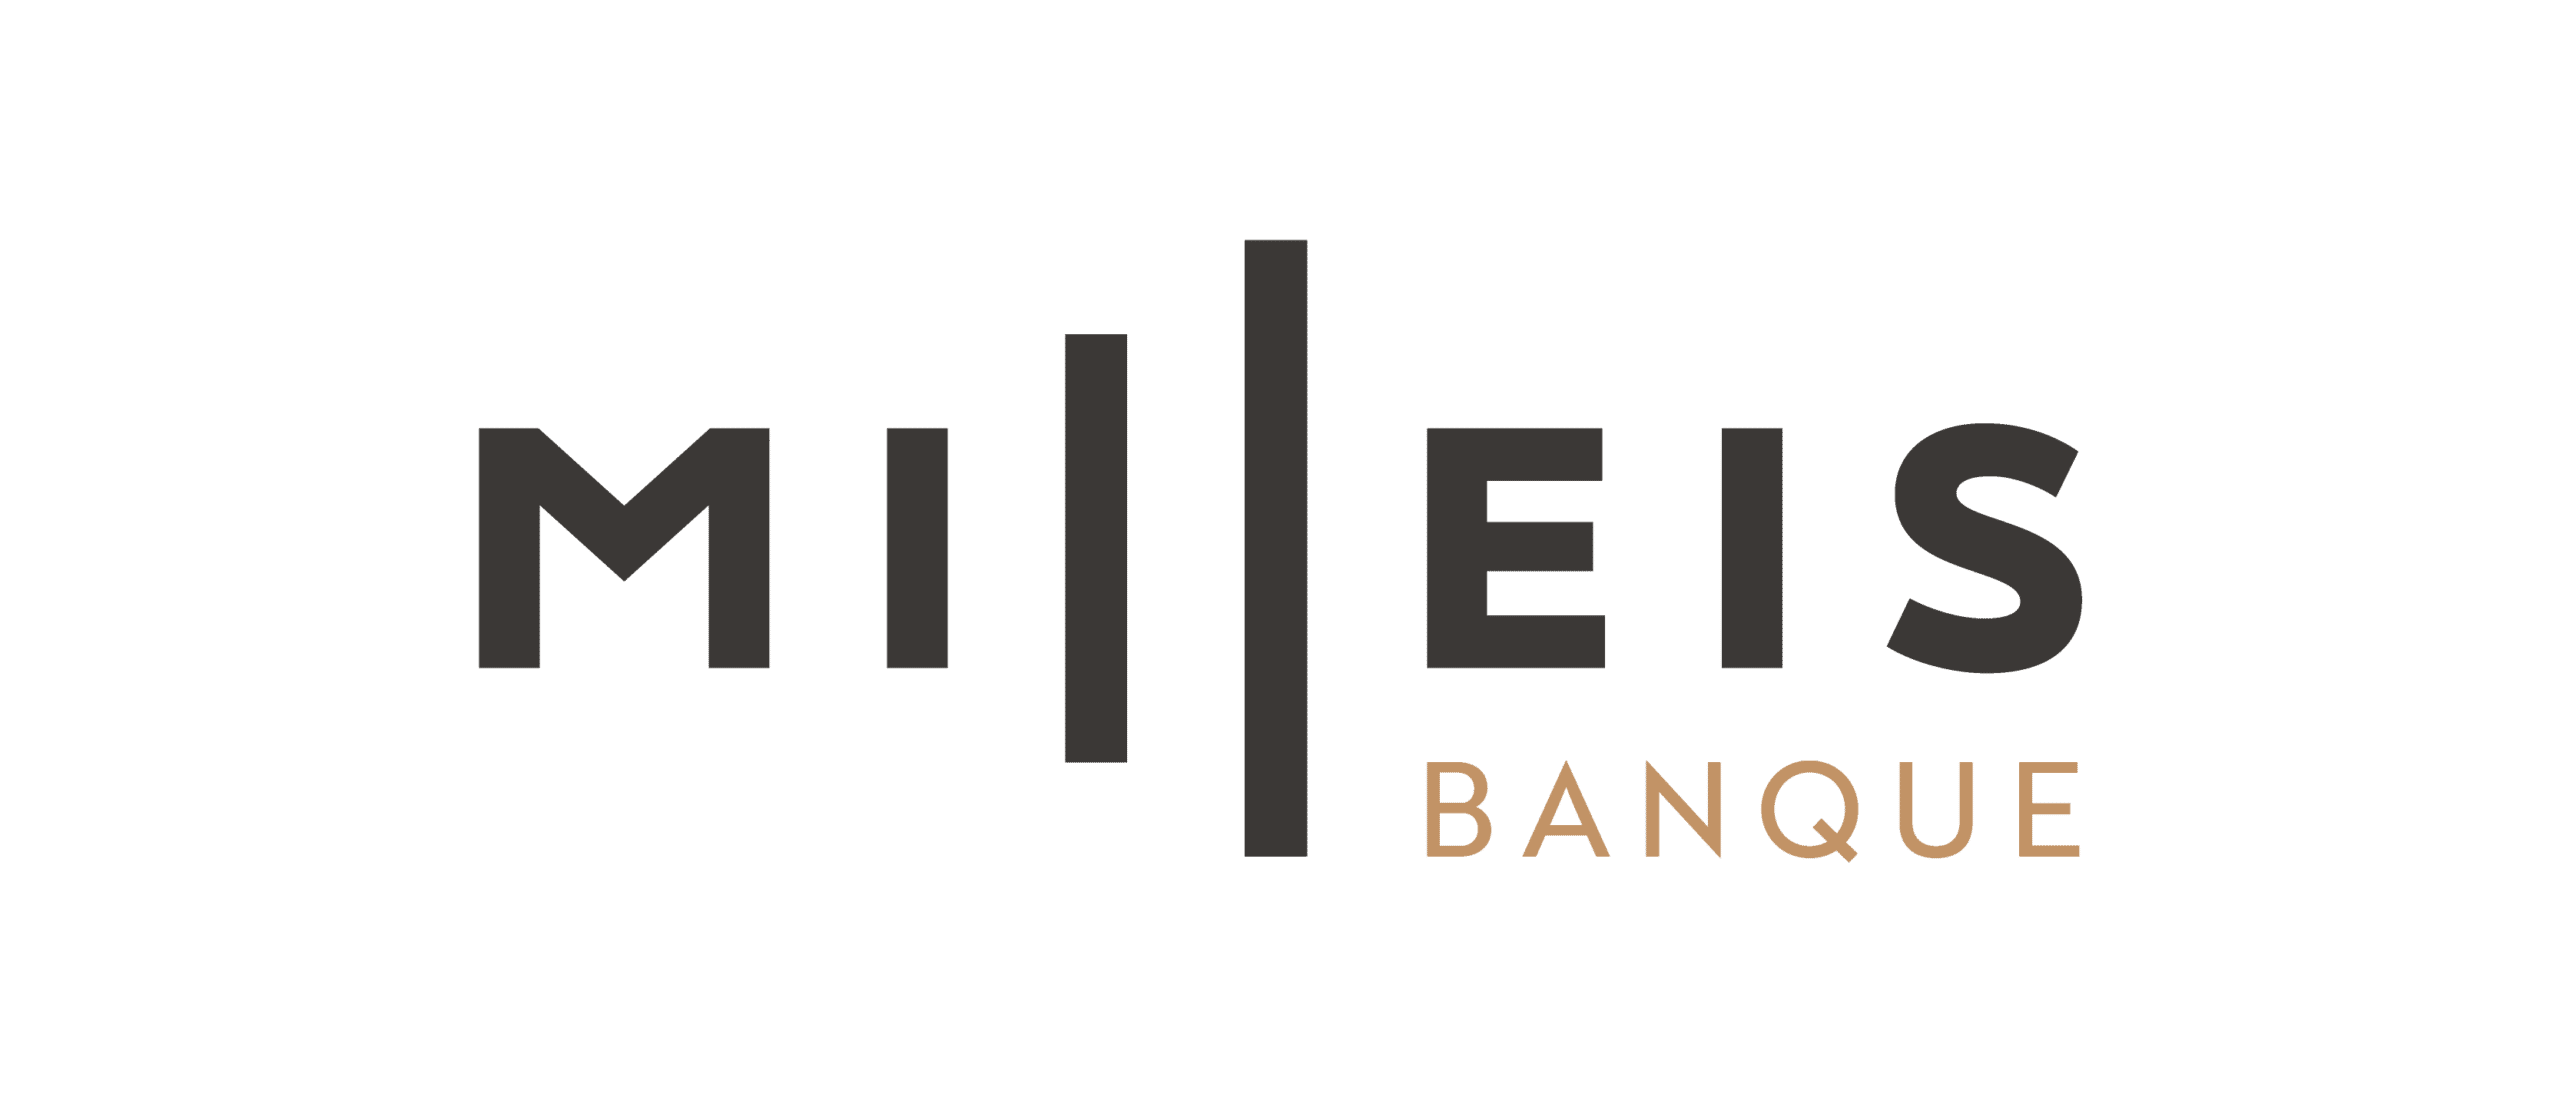 Milleis Banque Logo